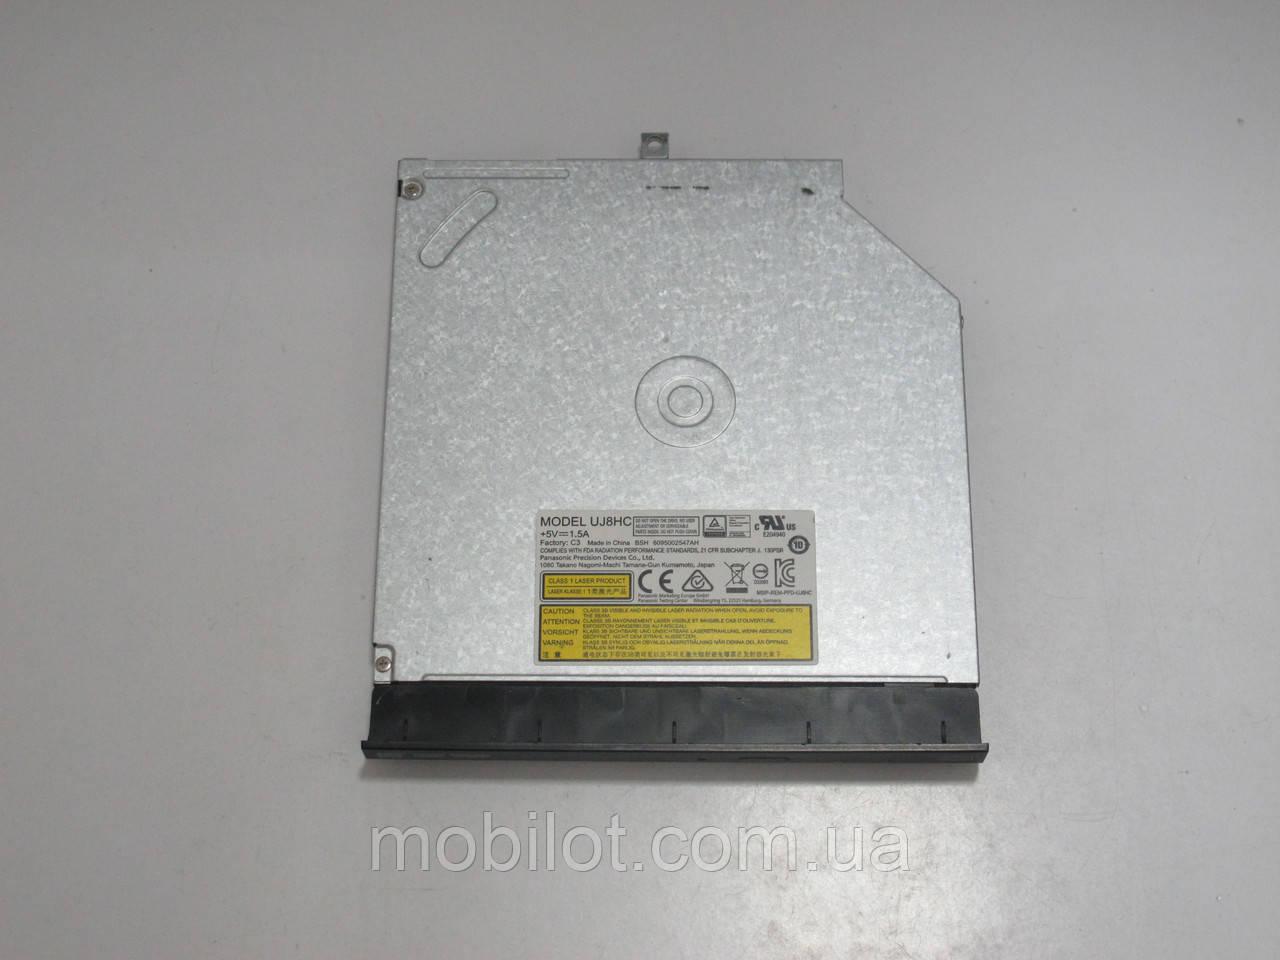 Оптический привод Acer E5-511 (NZ-6544)